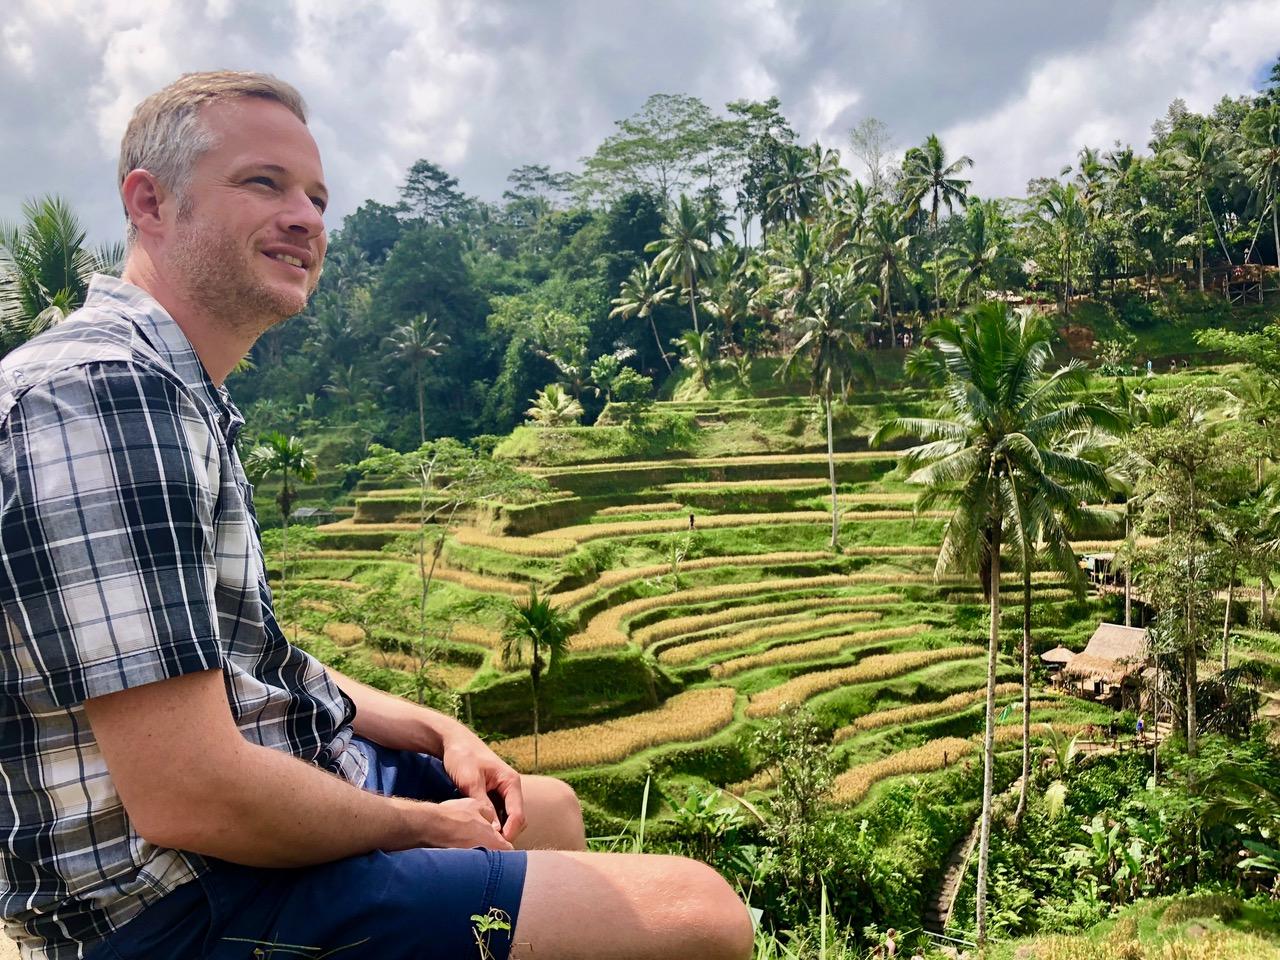 iPad Magie in Bali